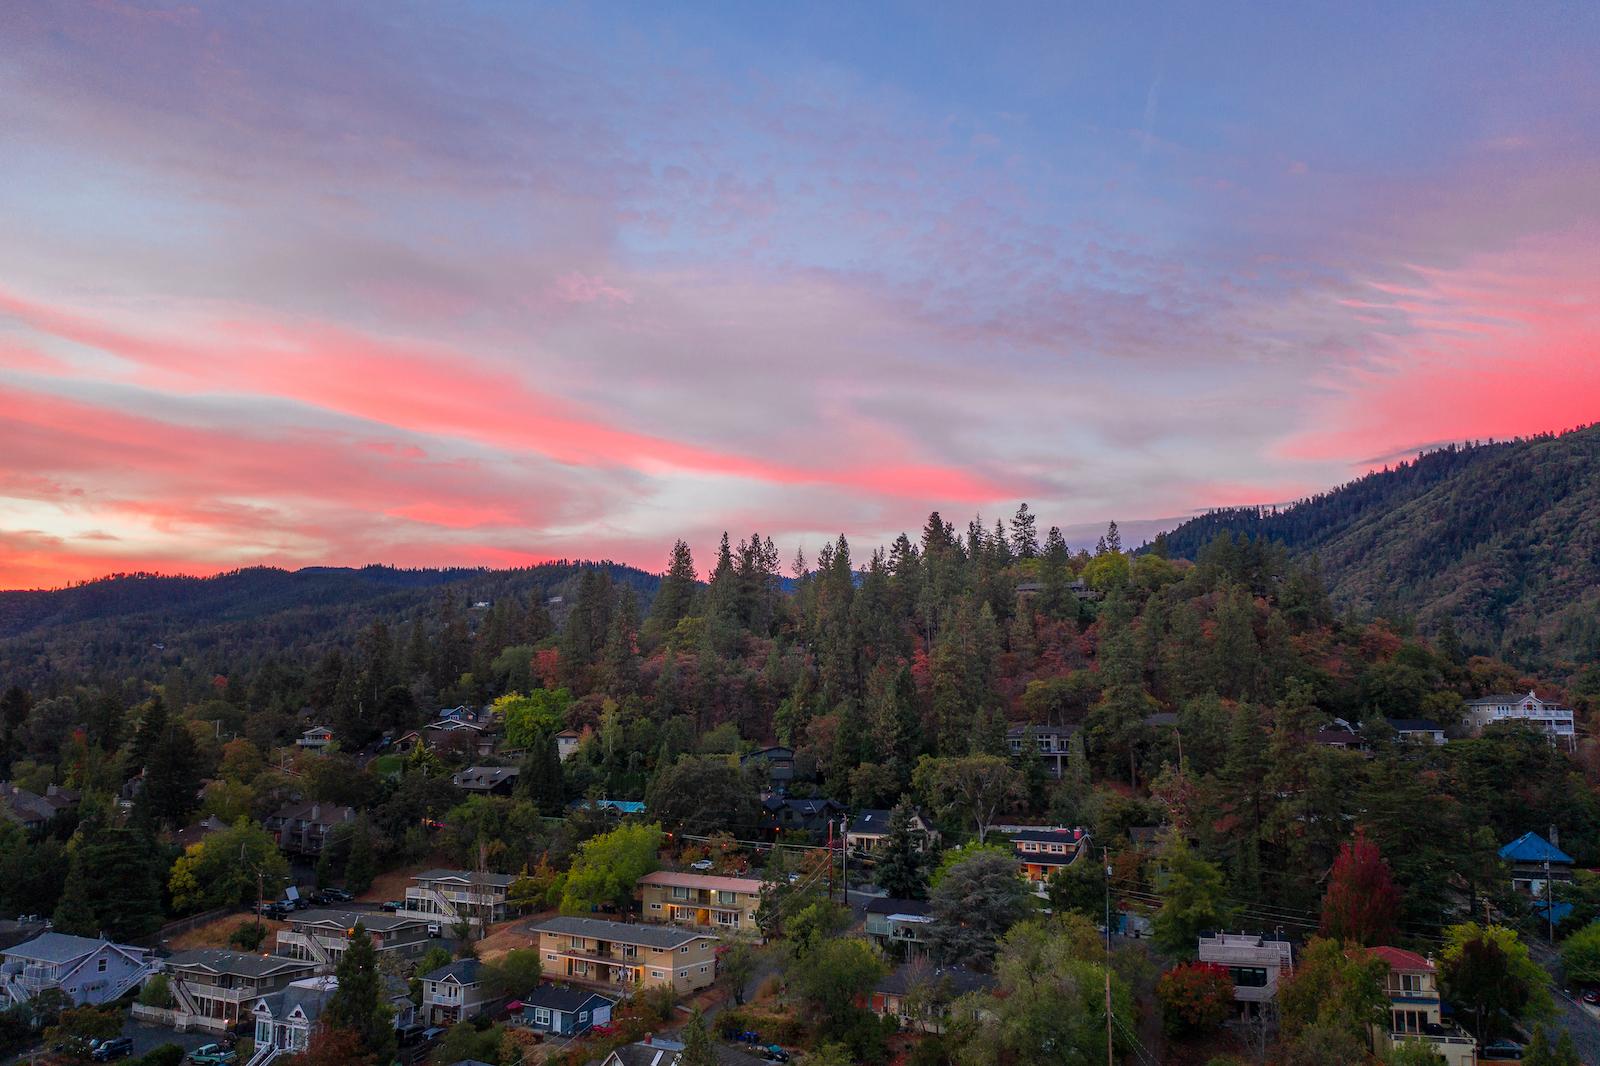 a sunset view of a town amidst tall fir trees